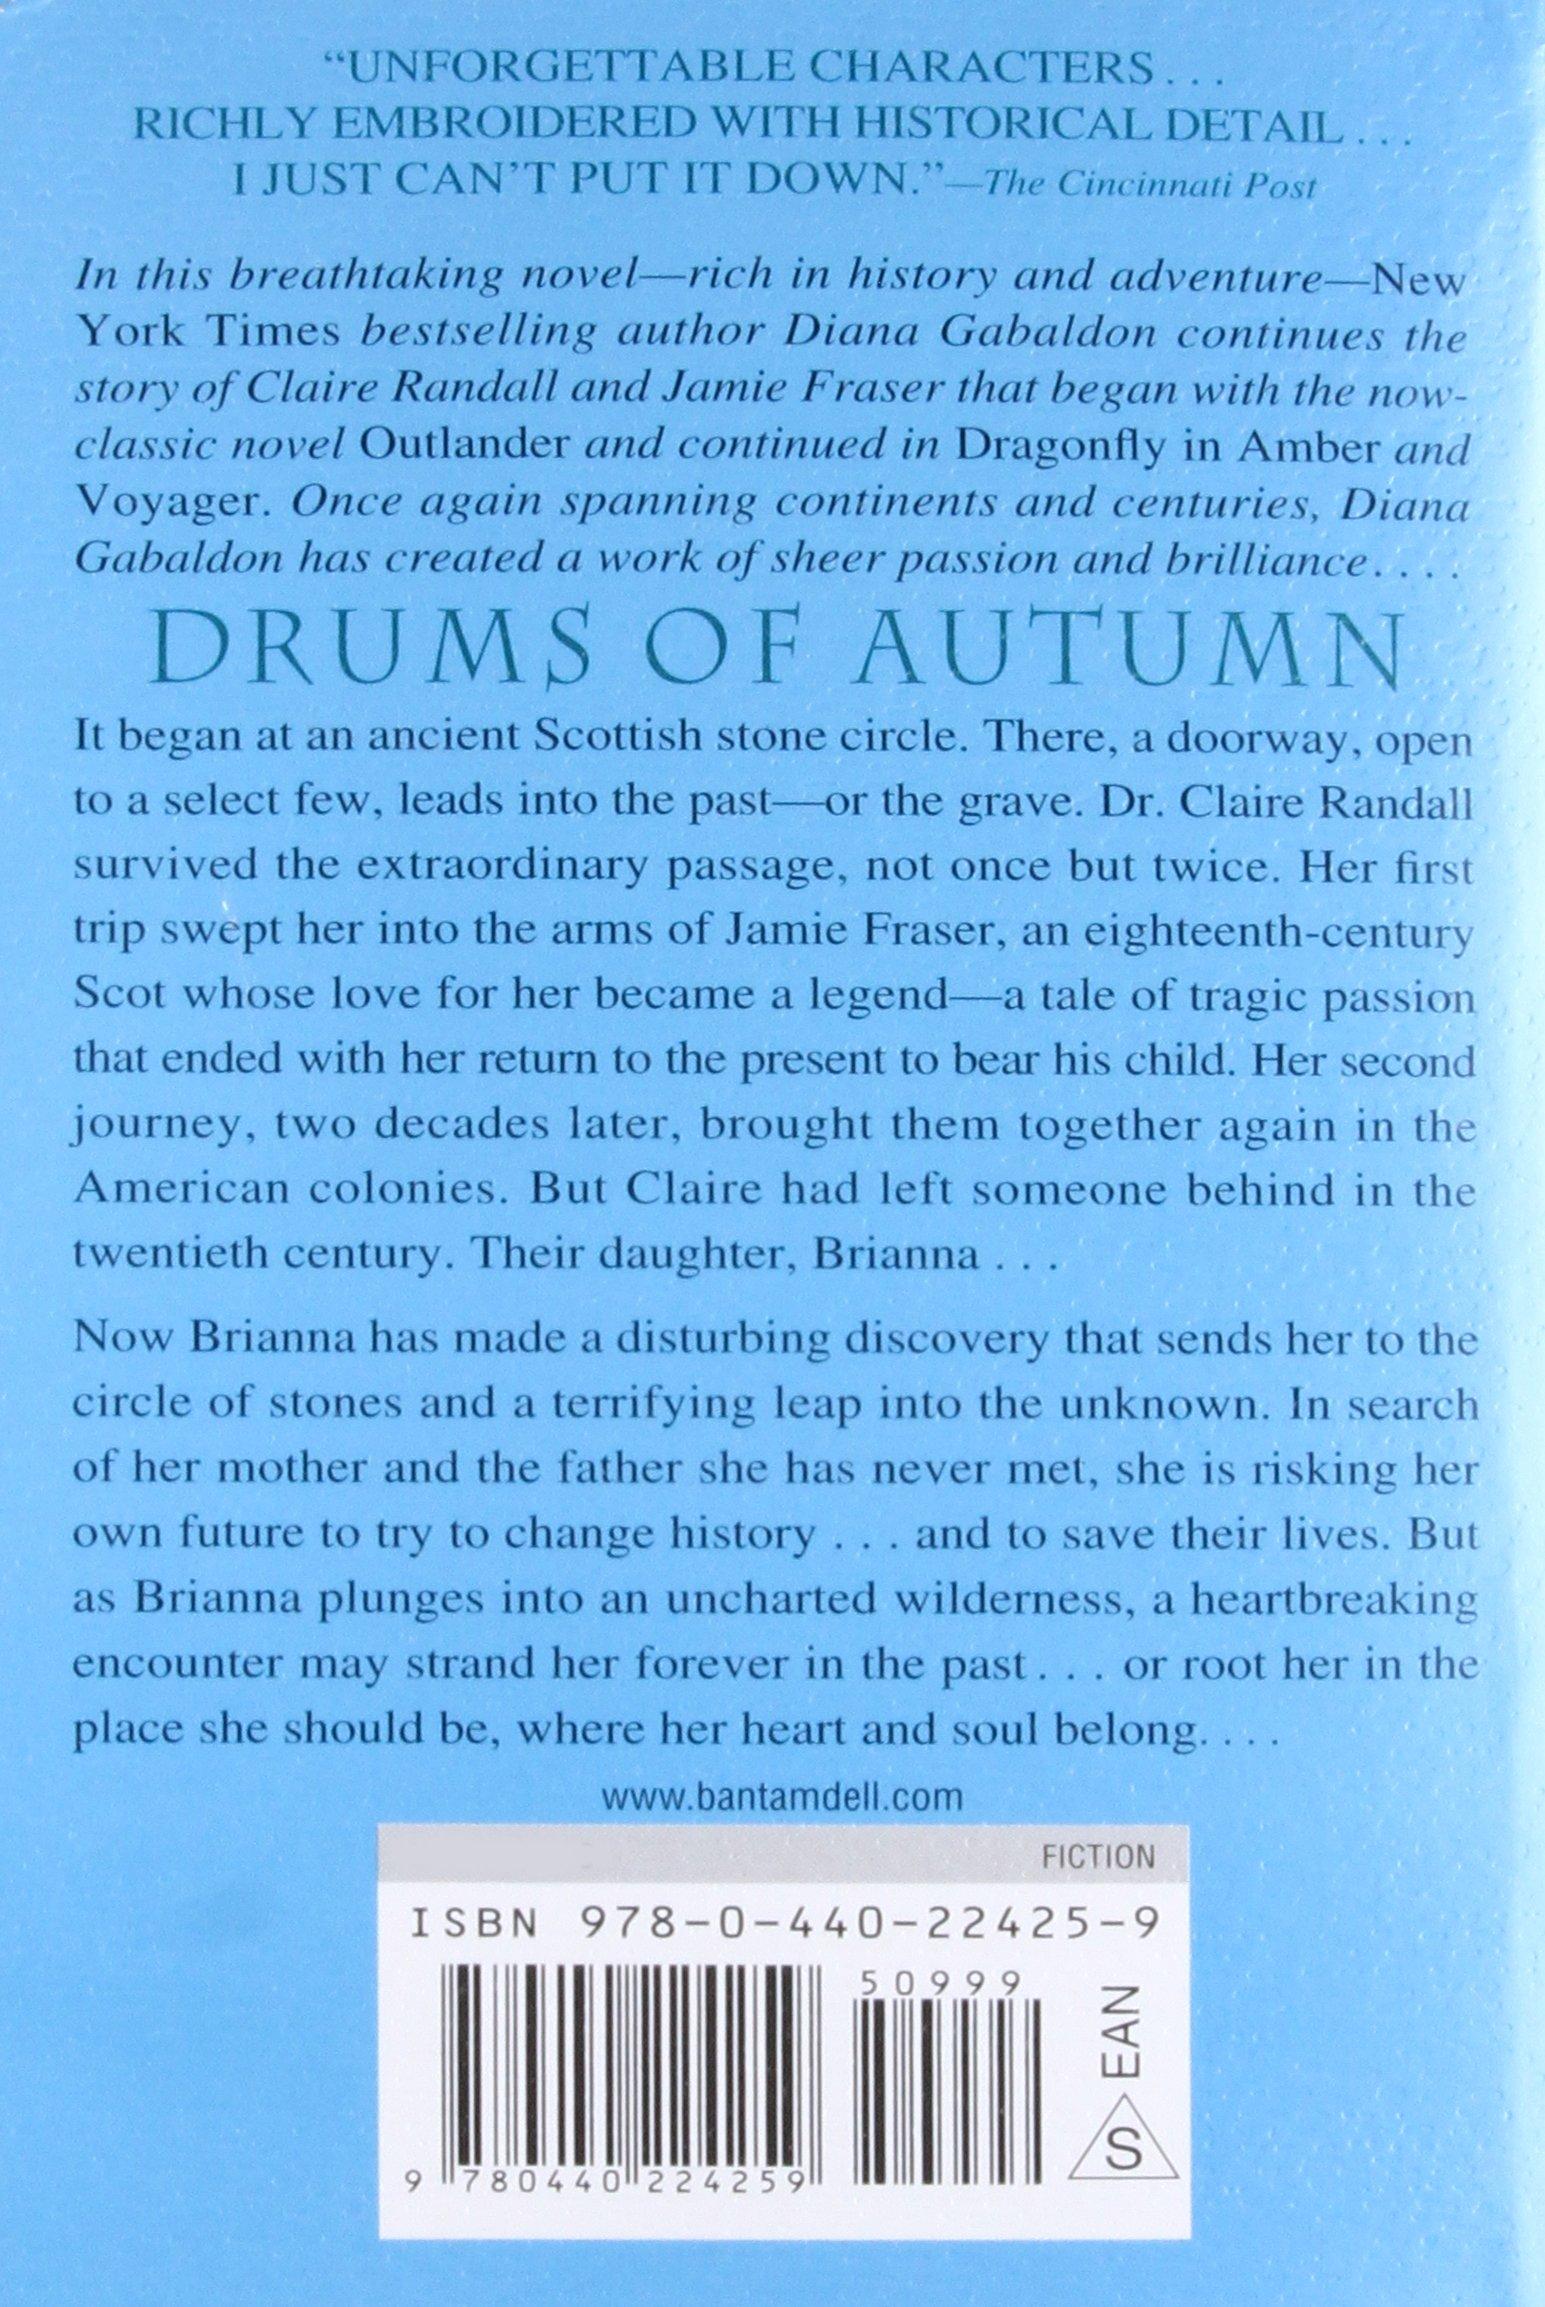 The drums of autumn diana gabaldon 9780440224259 amazon books fandeluxe Gallery